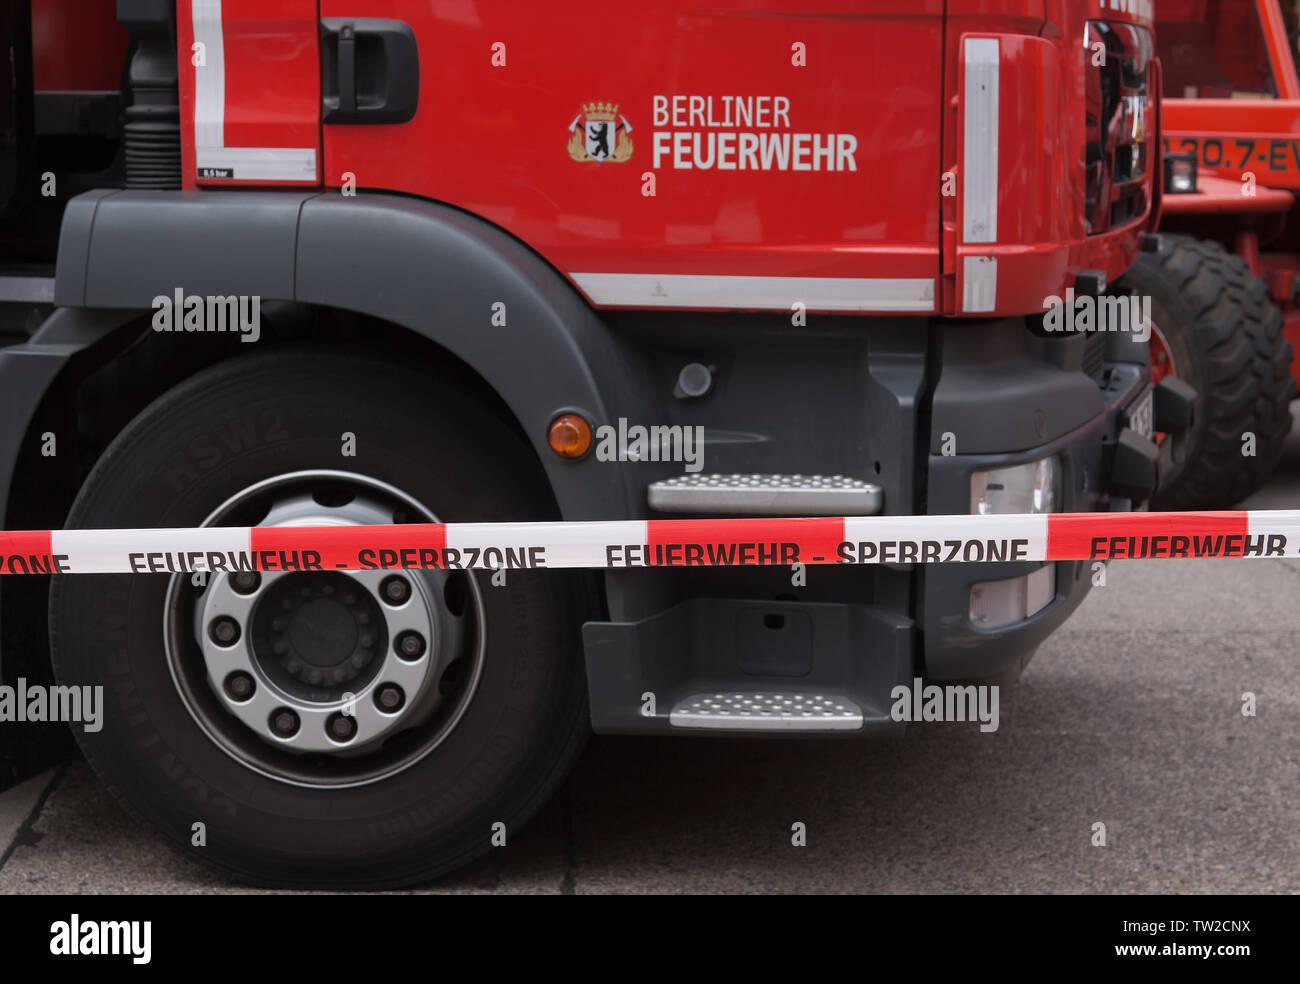 Fire department in Berlin - Stock Image